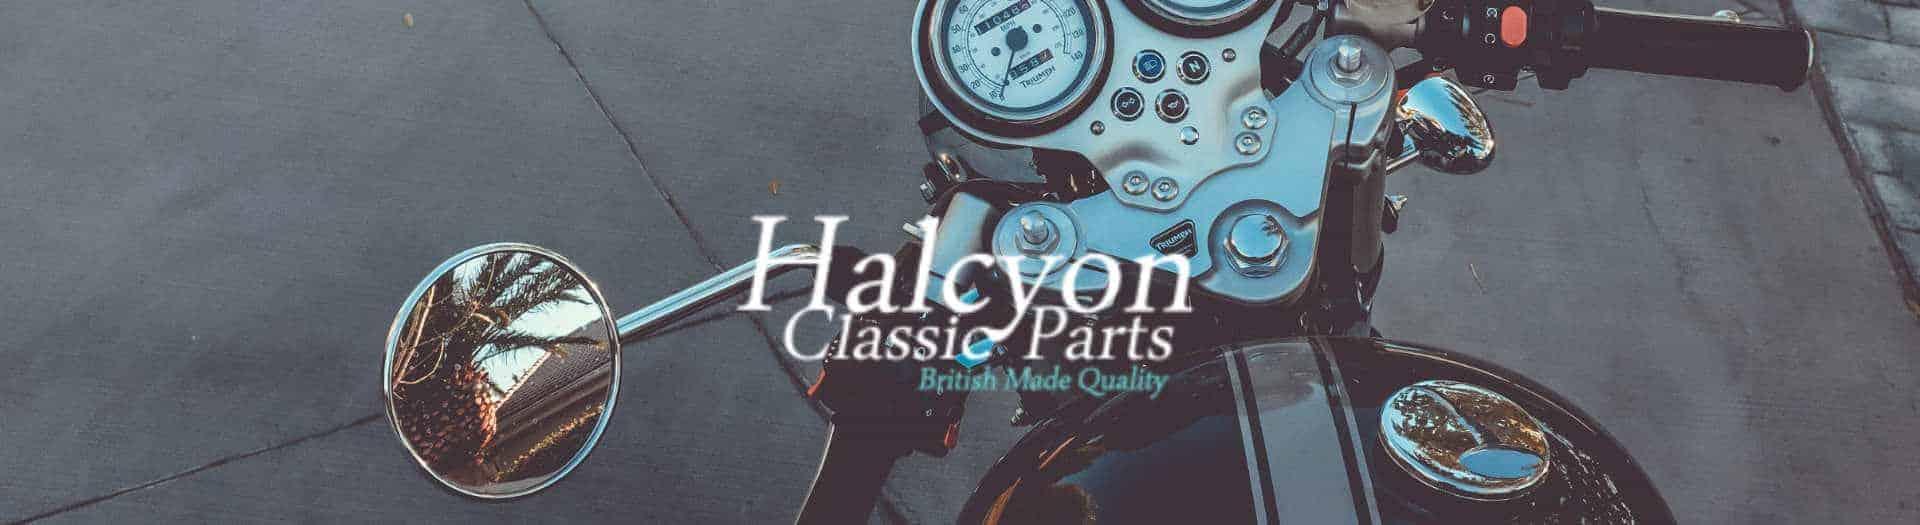 1920x525 Halcyon Goggles Logo header 1